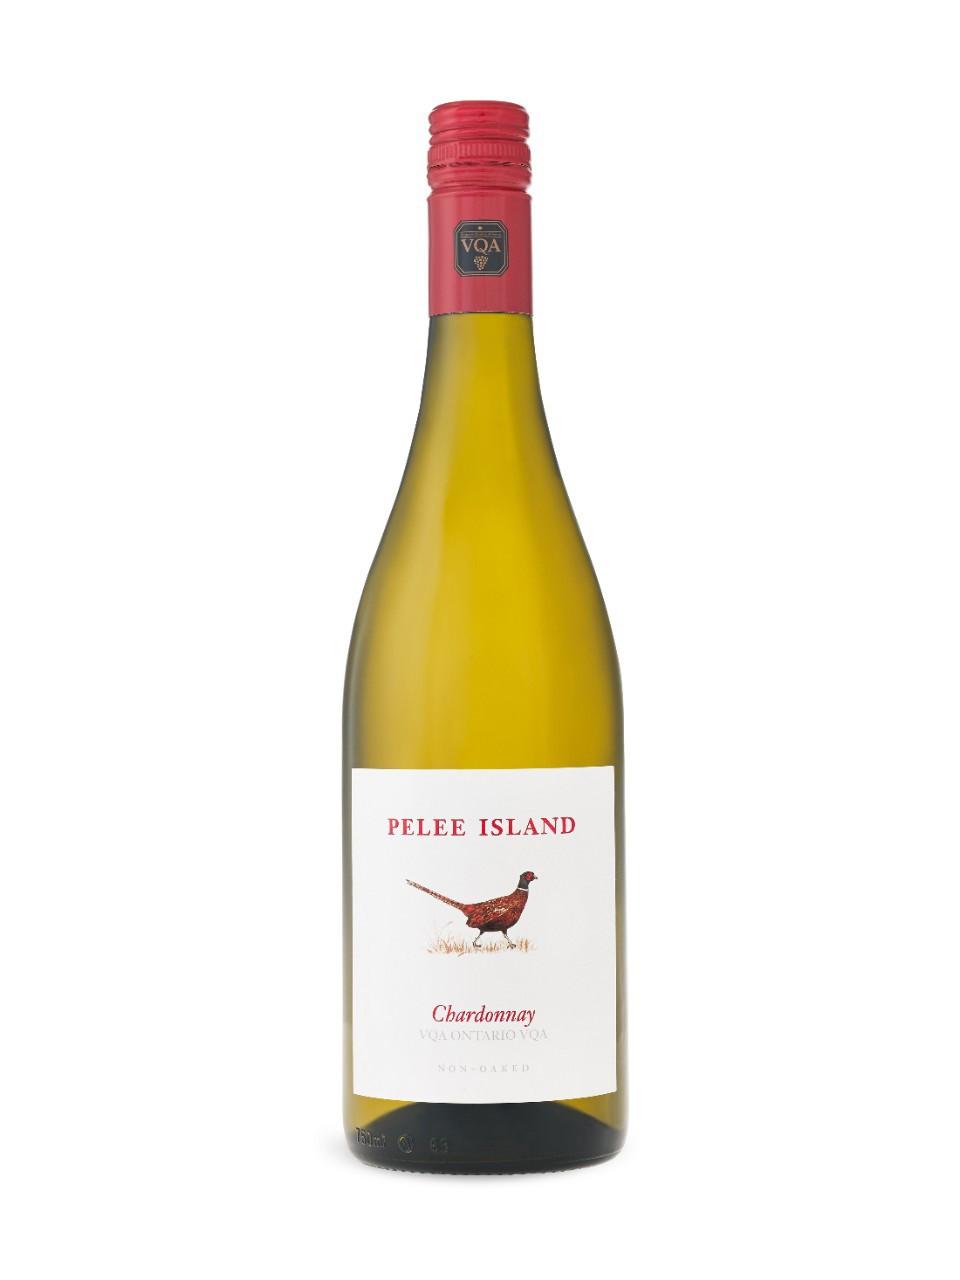 Pelee Island Chardonnay Vqa Lcbo